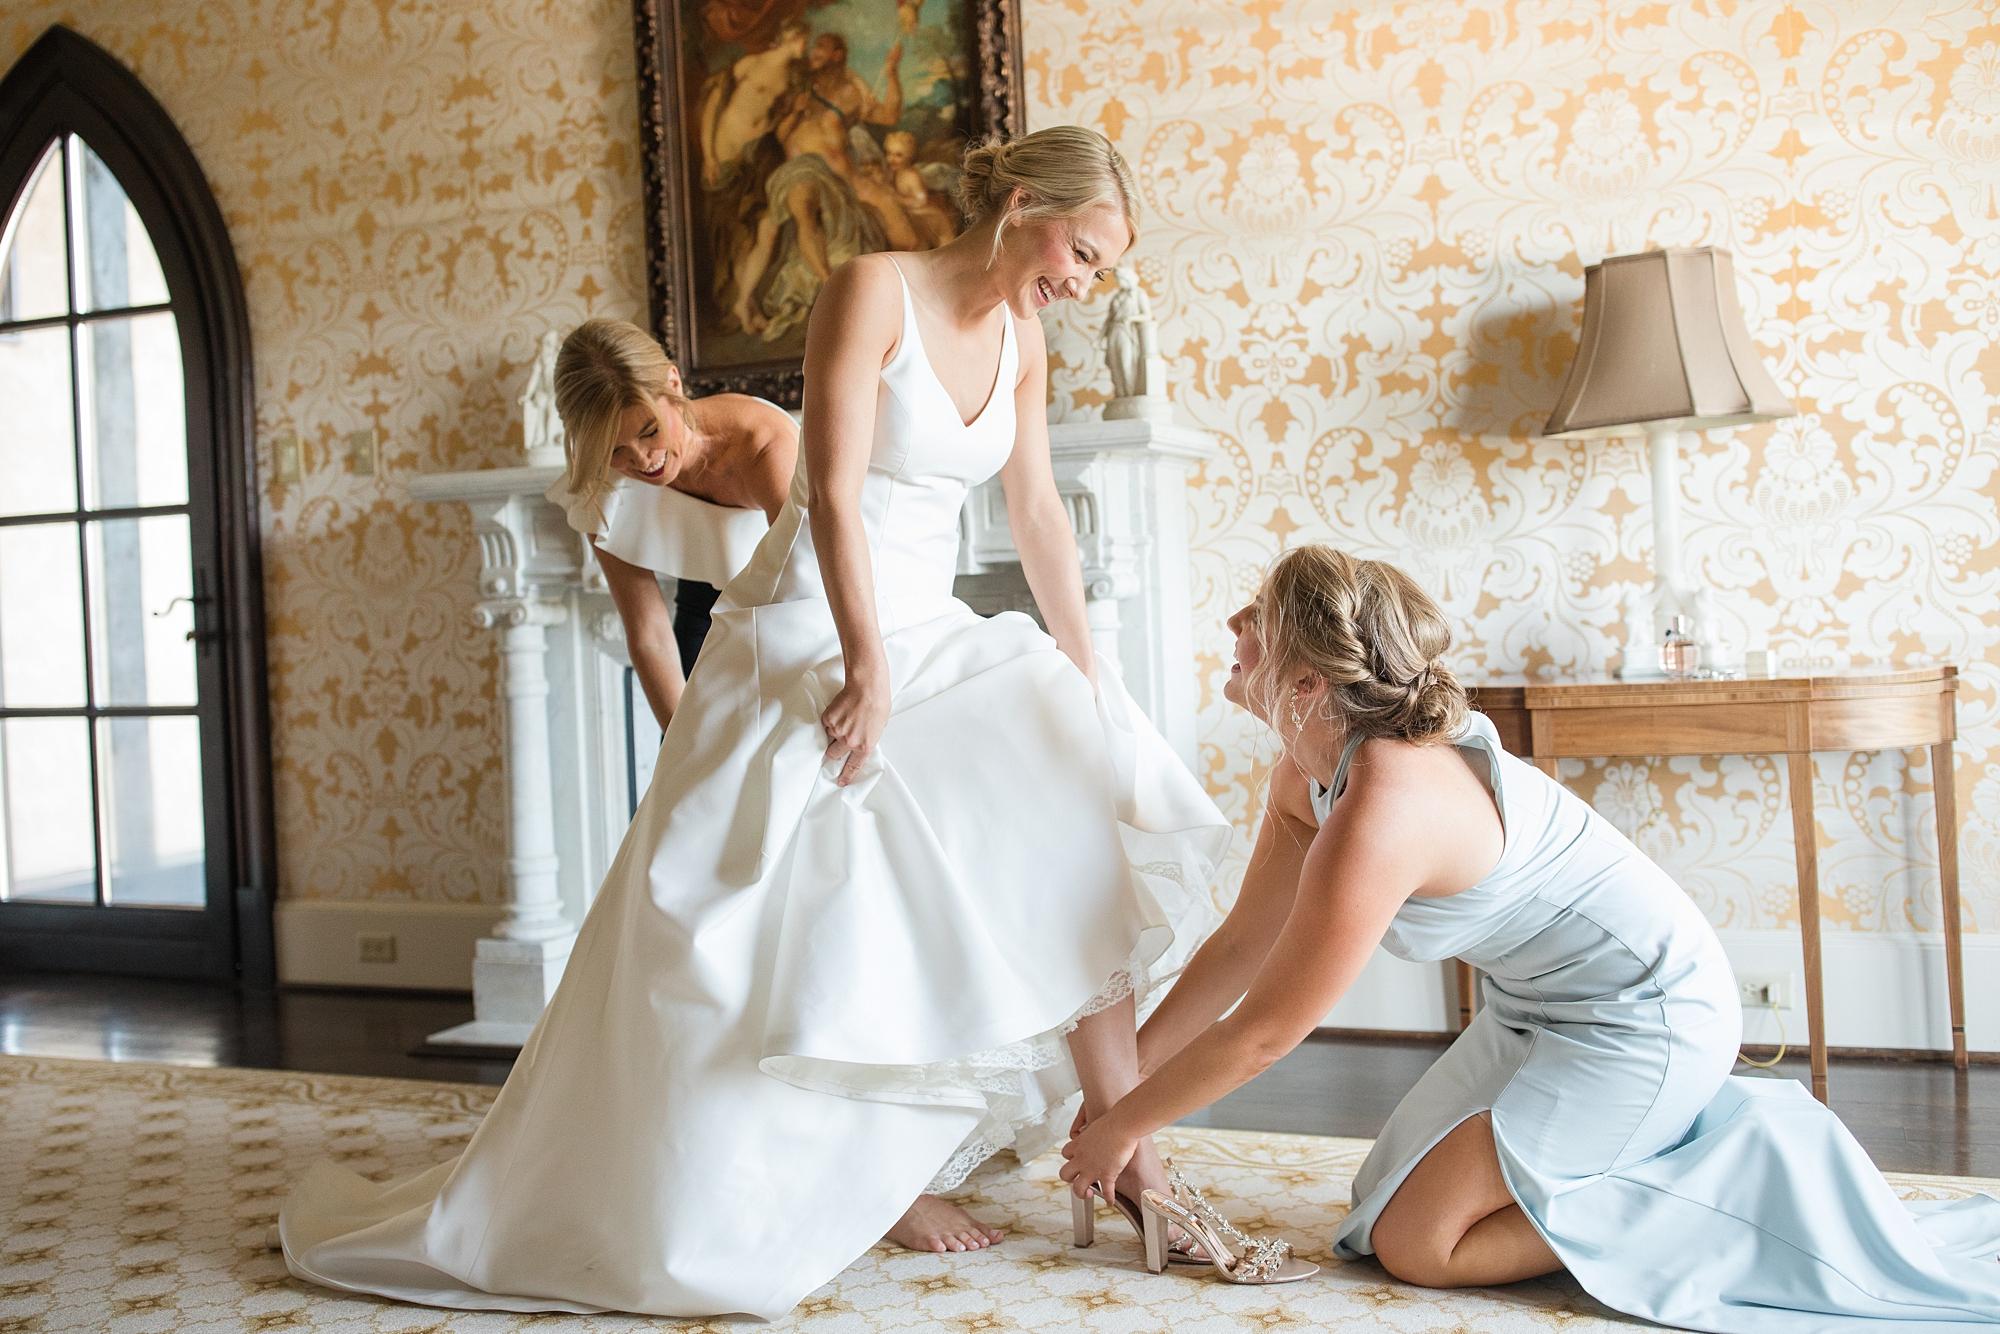 dover-hall-estate-richmond-wedding-goochland-virginiadover-hall-estate-richmond-wedding-goochland-virginia_5256